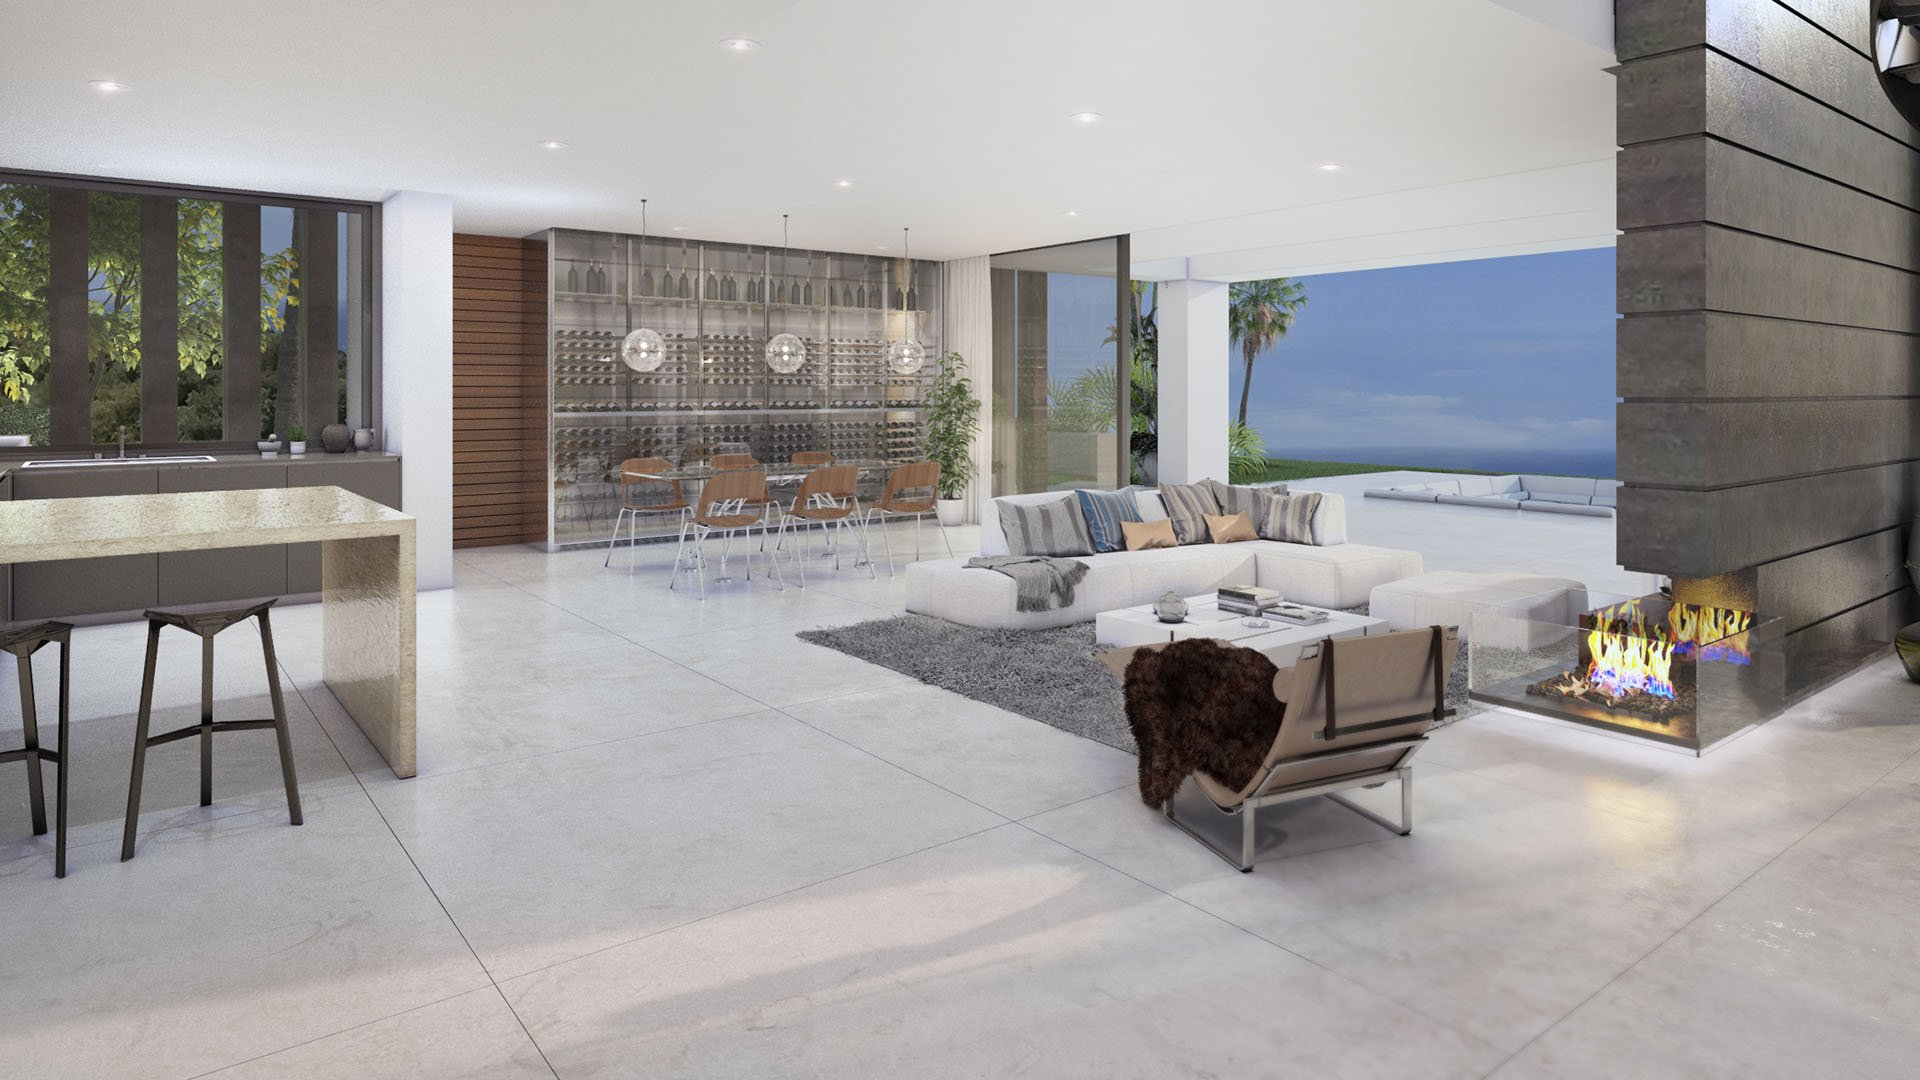 Villa Marlina: Contemporary villa with stunning sea views in Manilva